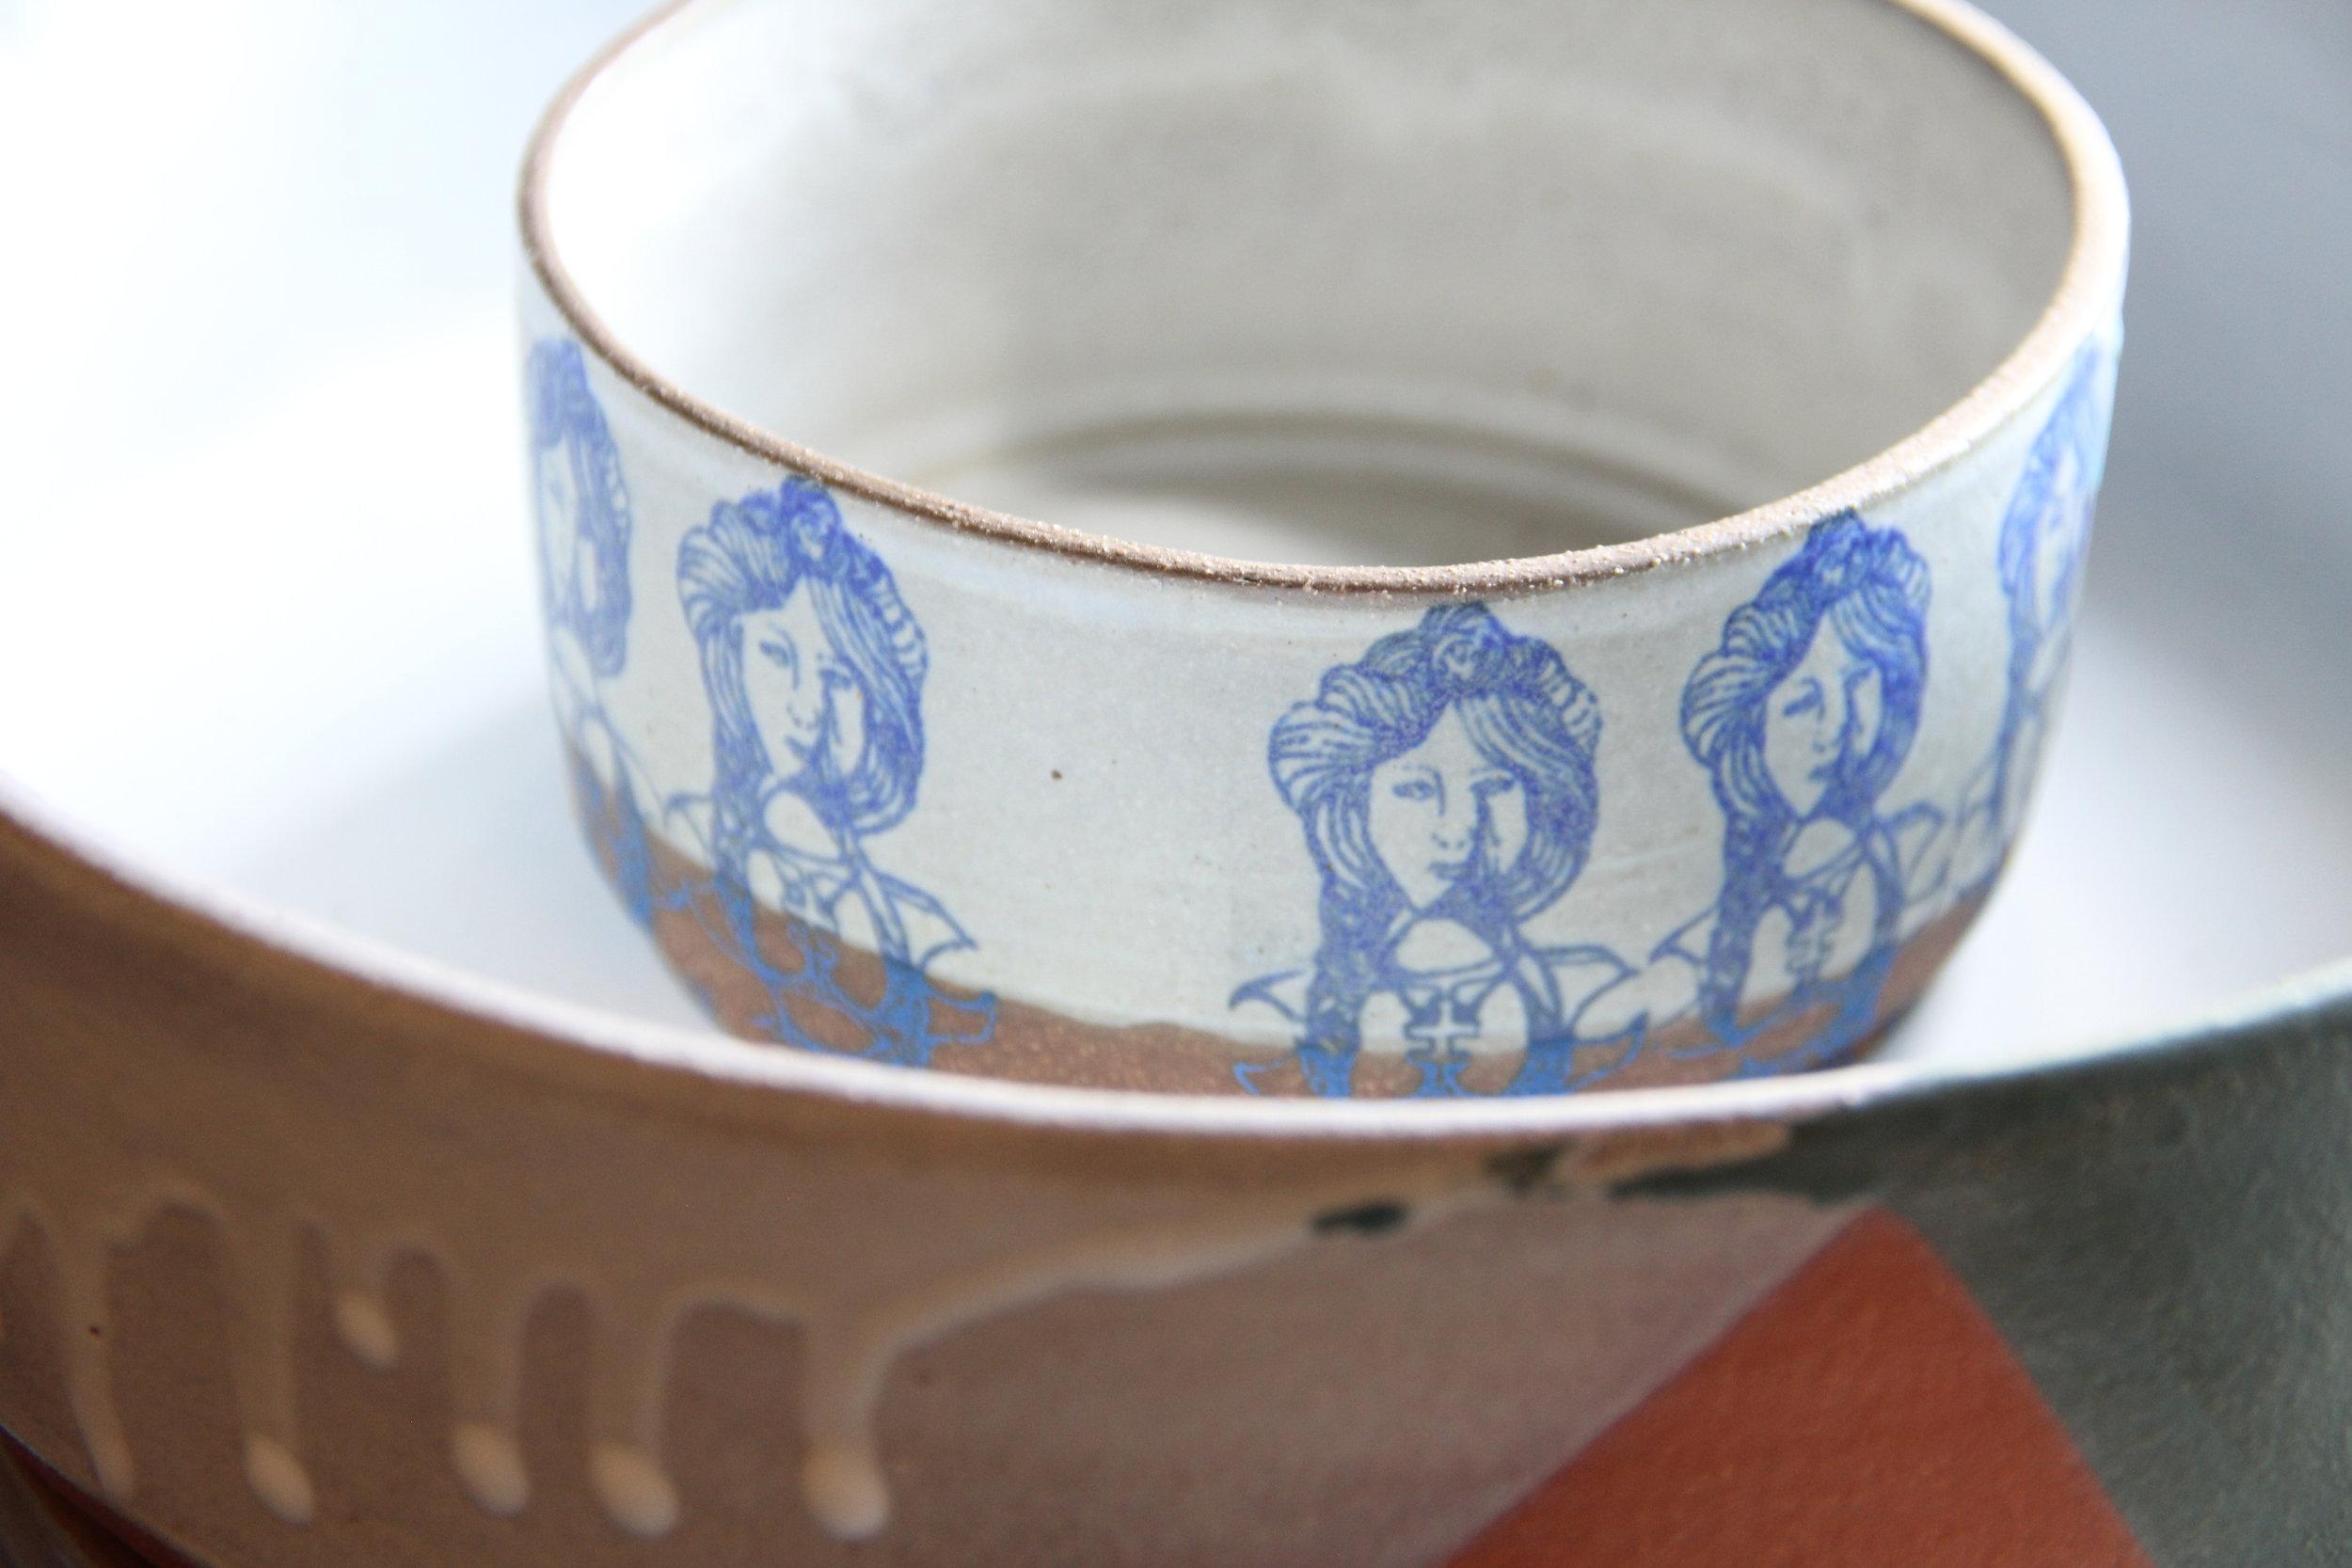 Rheino Ceramics